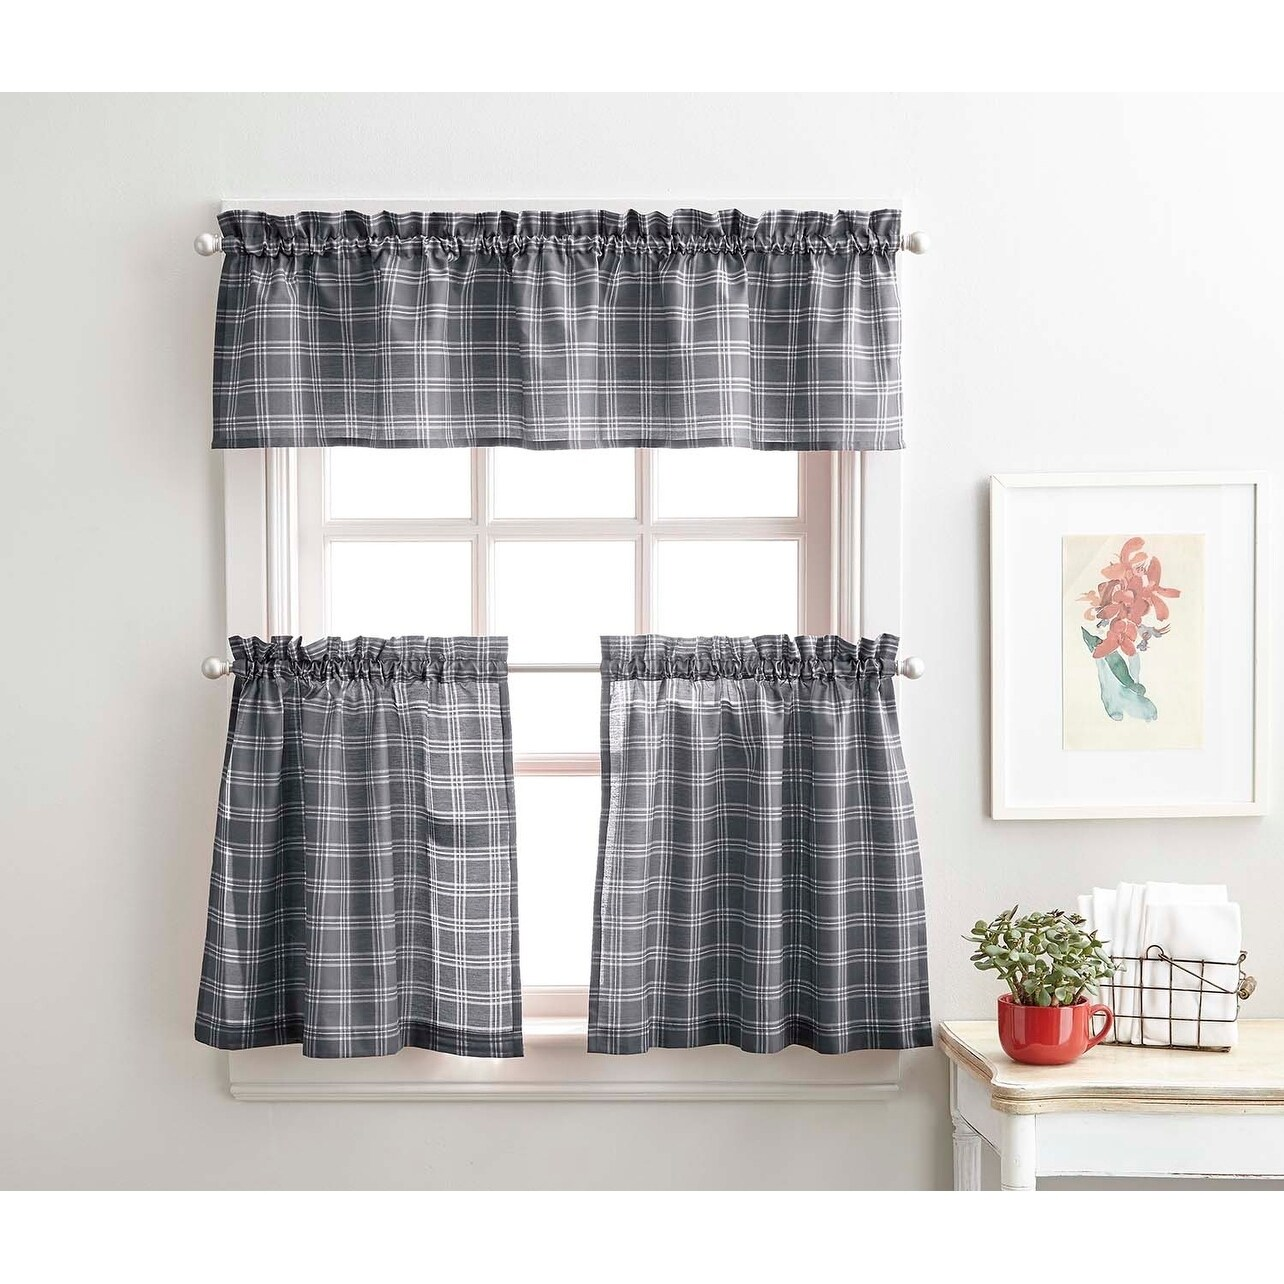 lodge plaid 3 piece kitchen curtain tier and valance set 36 3pc set